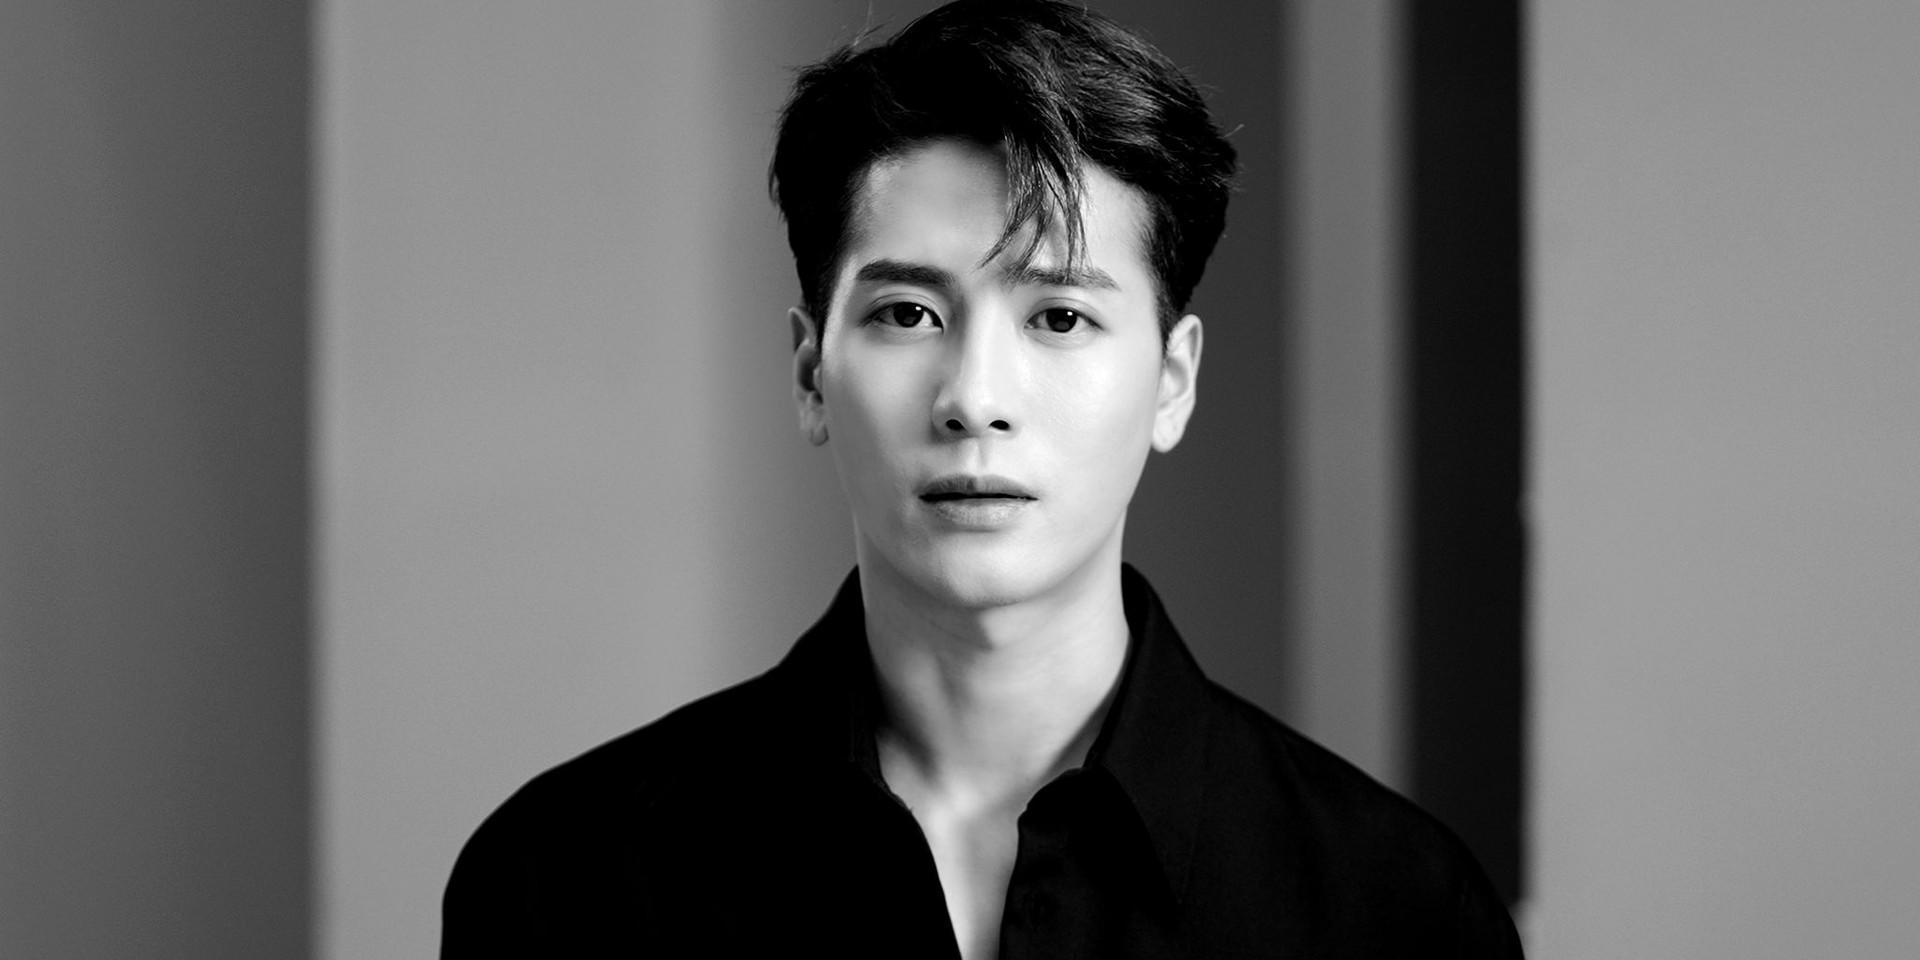 GOT7's Jackson Wang to star in short film for 13th Shanghai Biennale